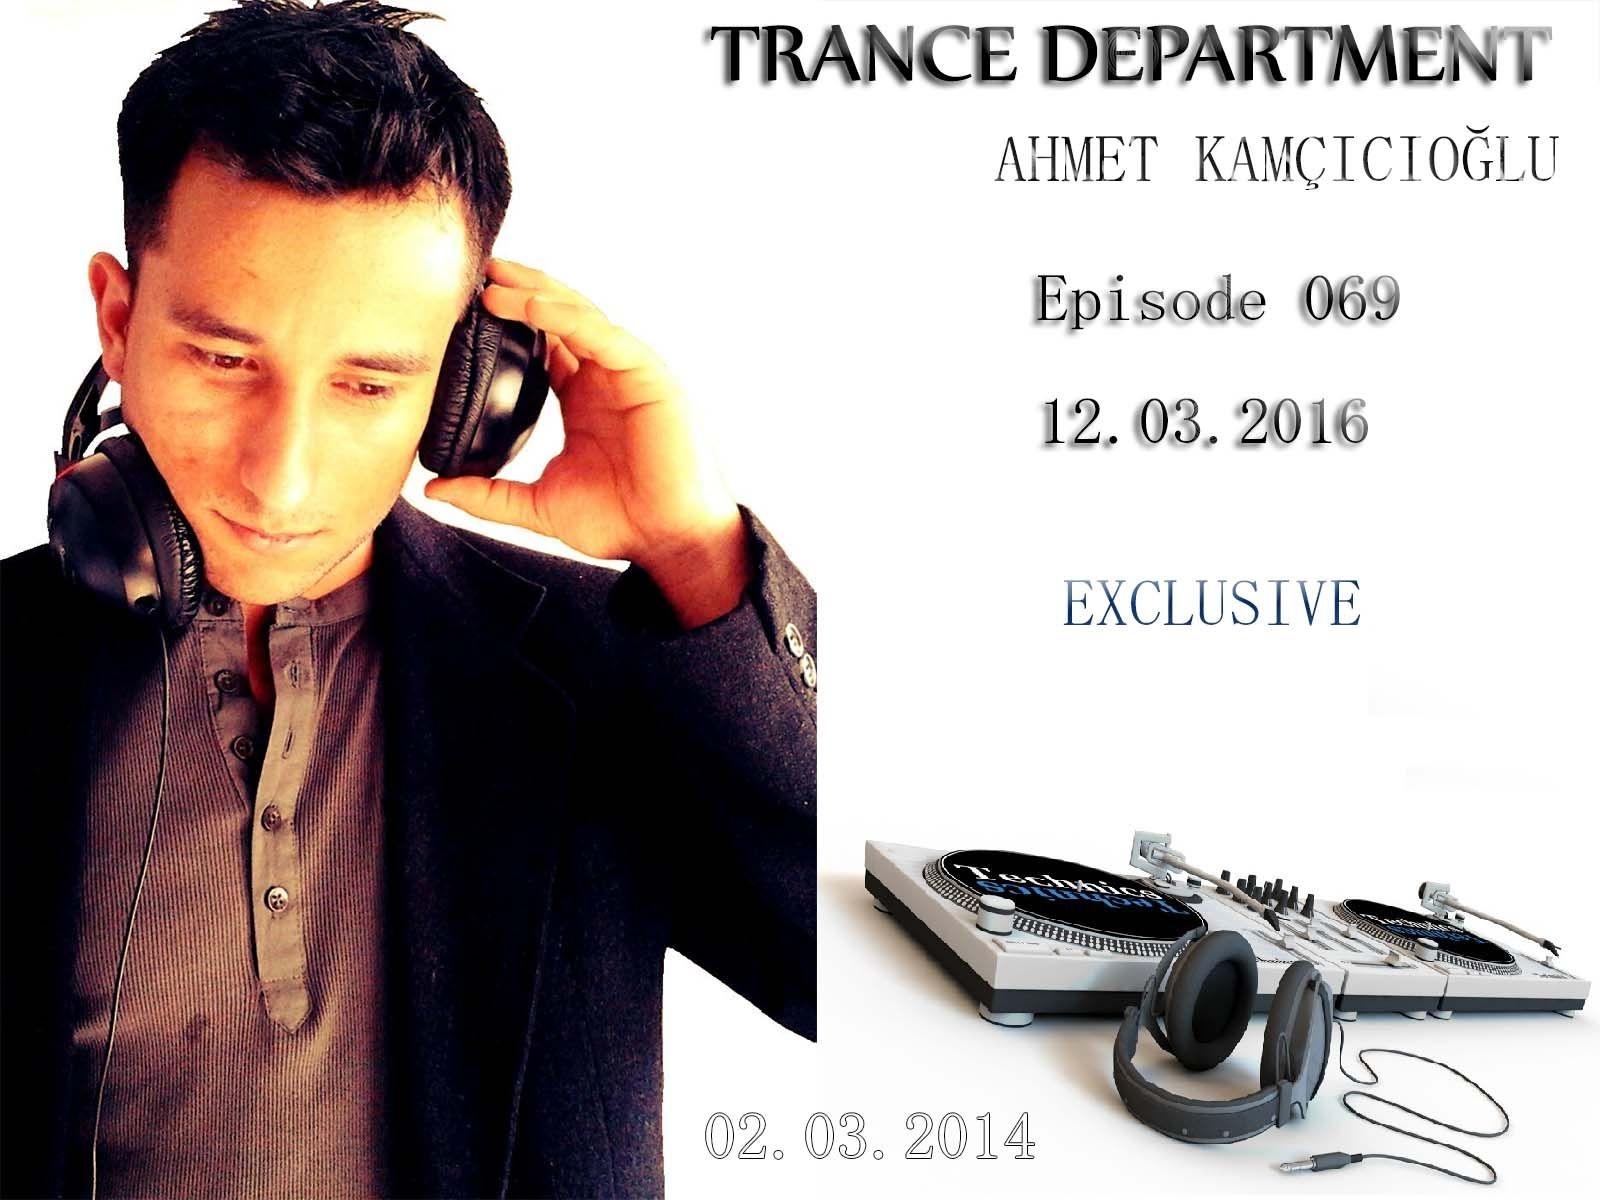 Ahmet Kamcicioglu - Trance Department 069 [Exclusive Mix] ()